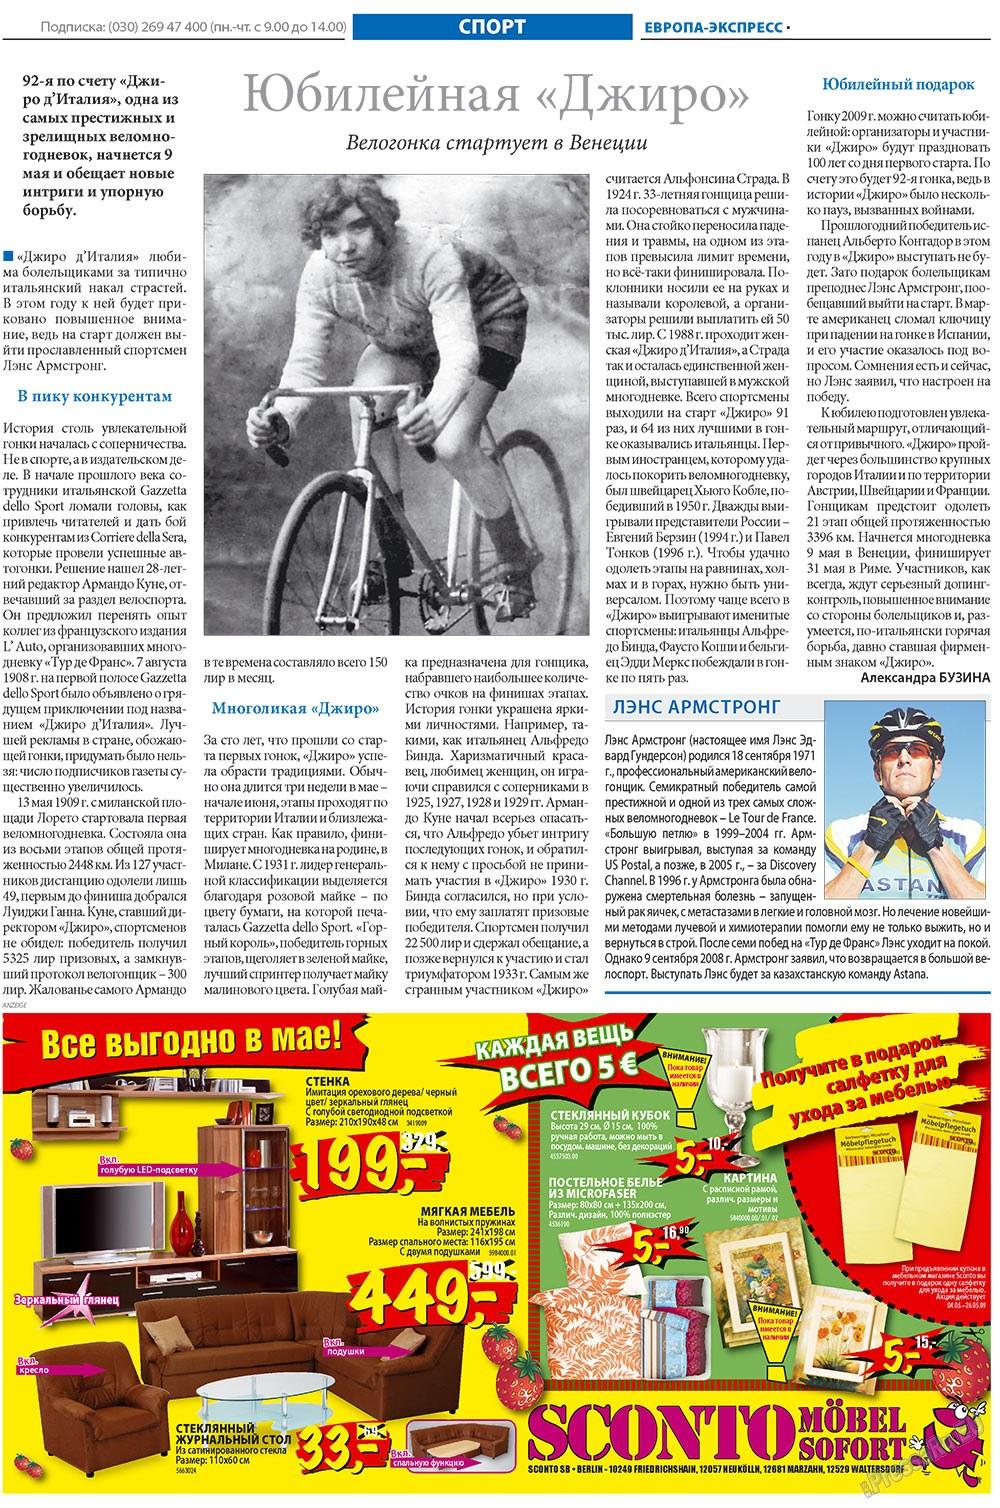 Европа экспресс (газета). 2009 год, номер 19, стр. 24